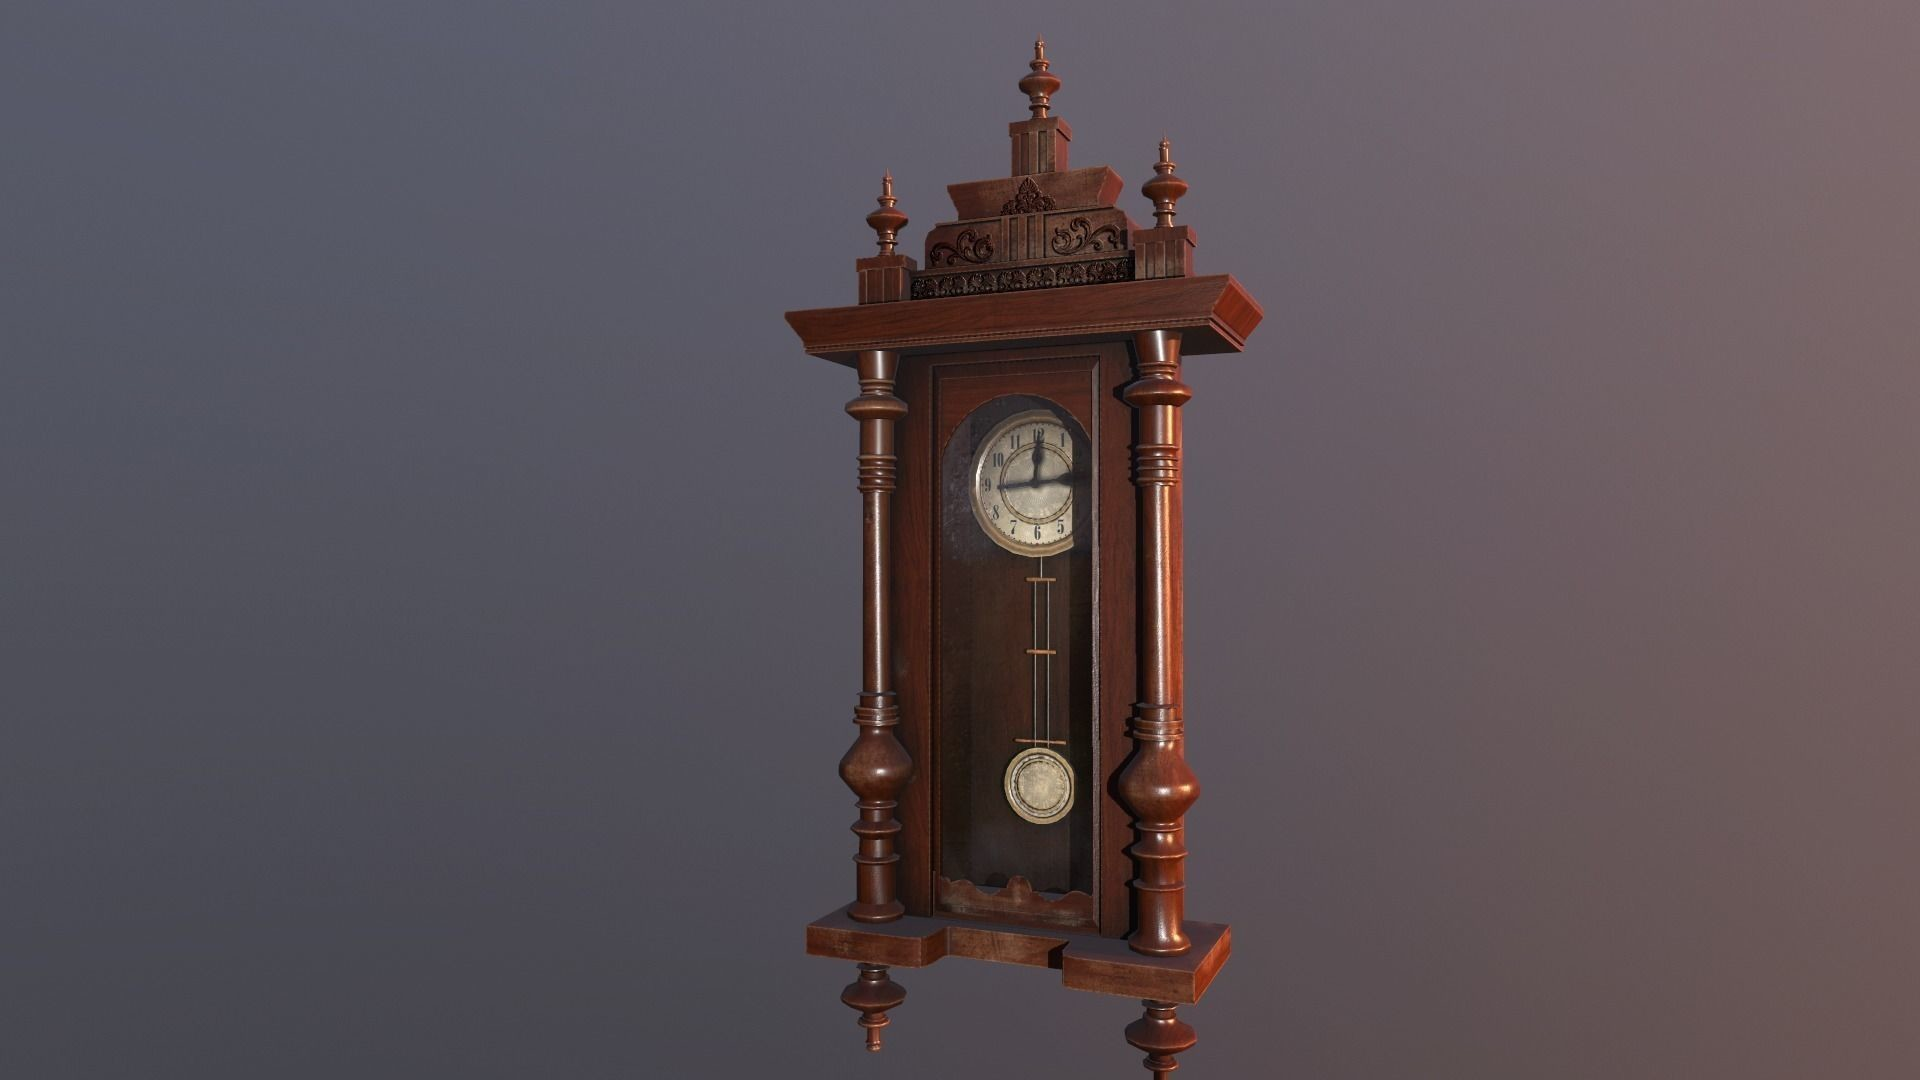 Morgan grandjean clock lowpoly vr 3d model low poly obj